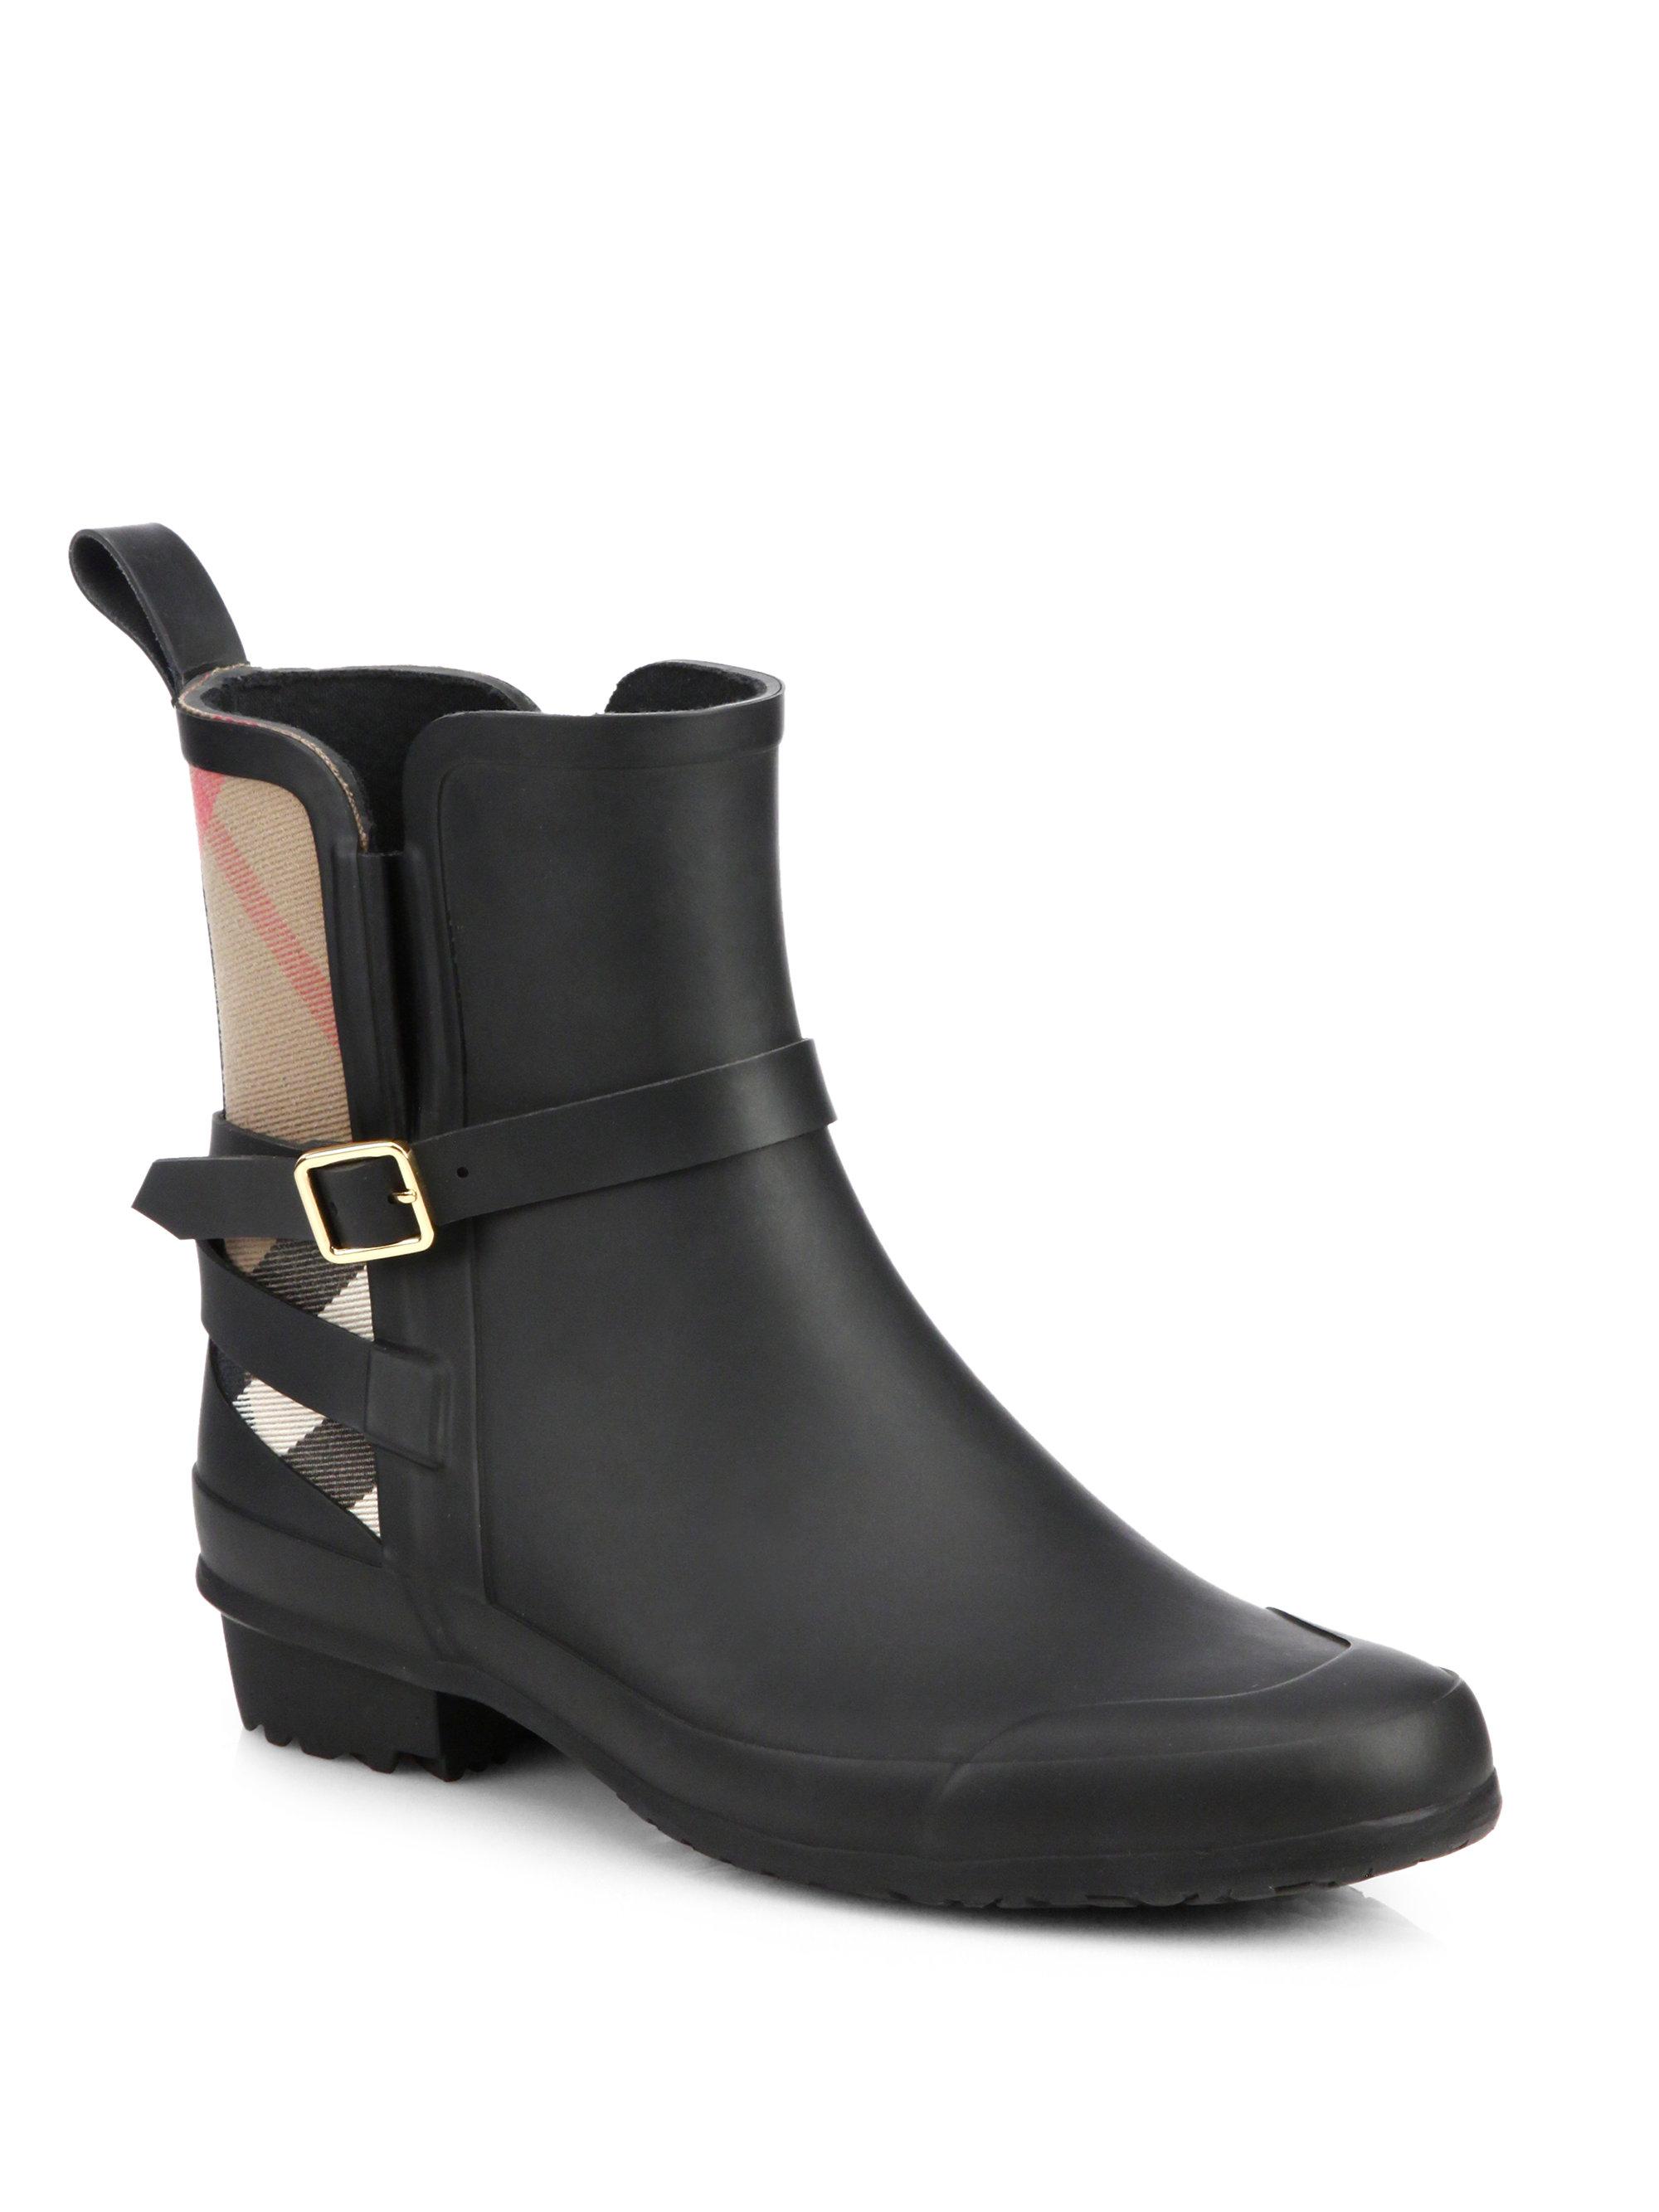 burberry riddlestone short rain boots in black for men lyst